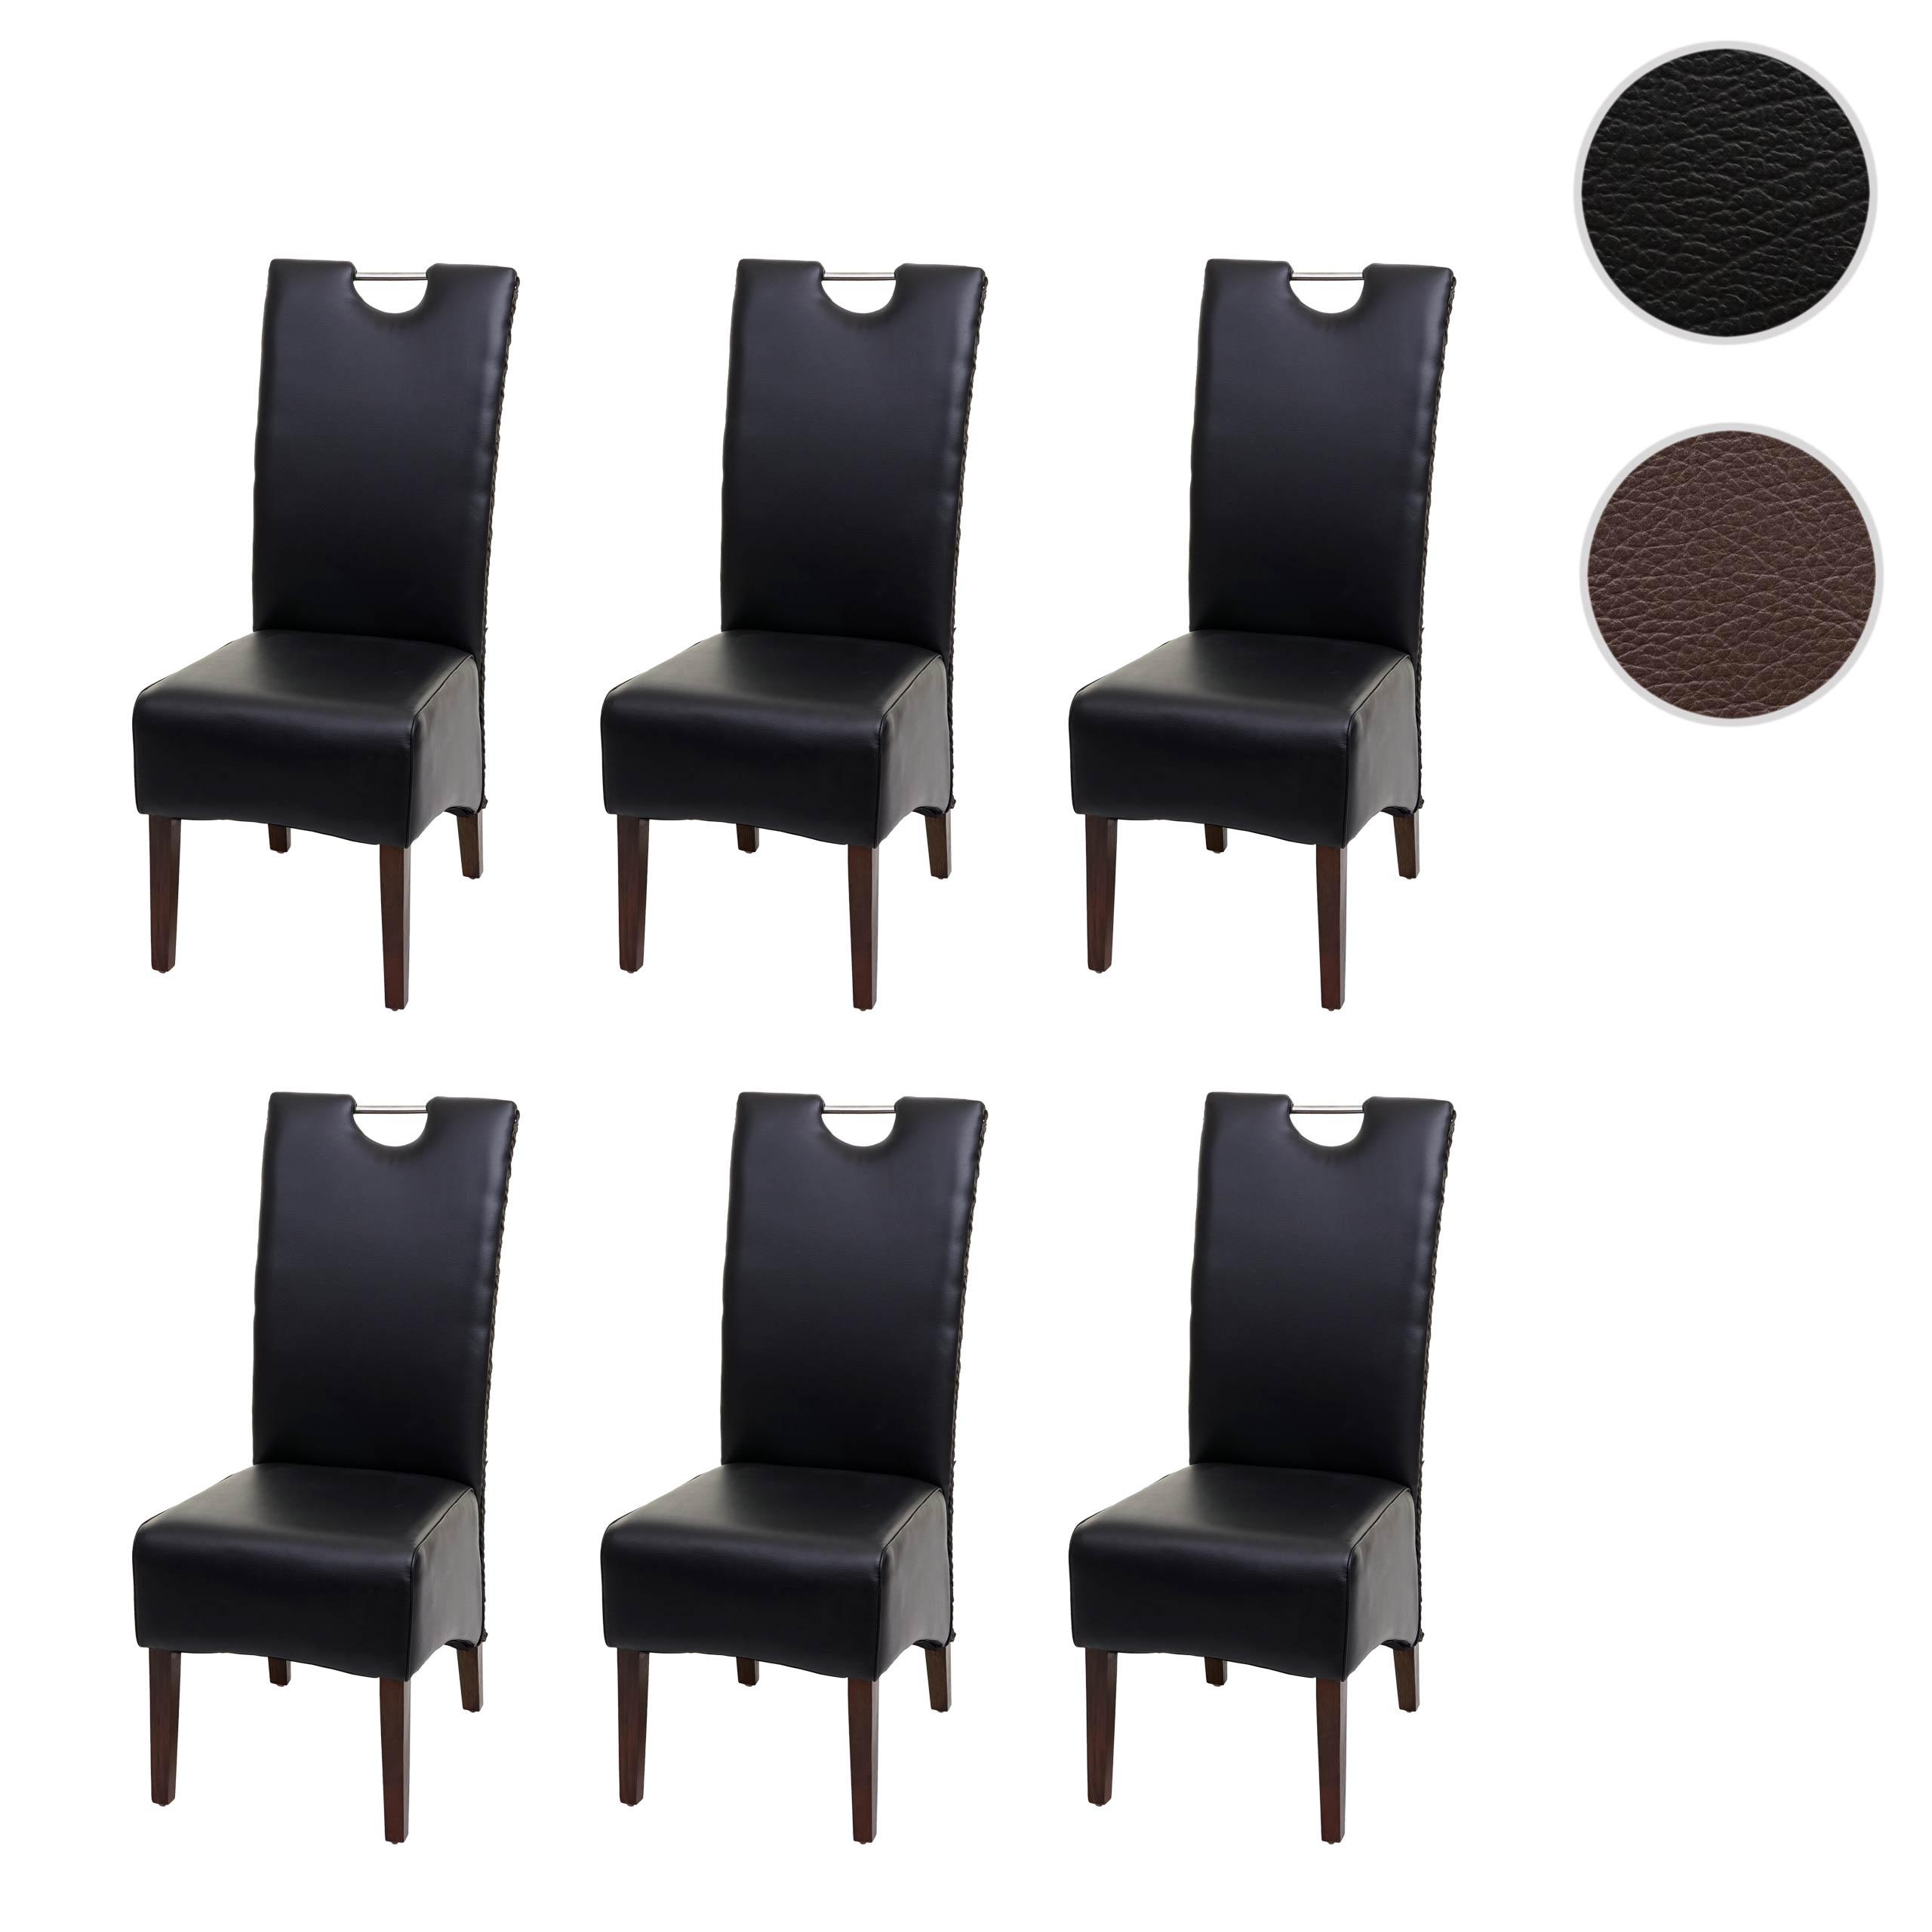 6x Esszimmerstuhl HWC H13, Küchenstuhl Stuhl, Kunstleder Massivholz echtes Rattan Korbgeflecht